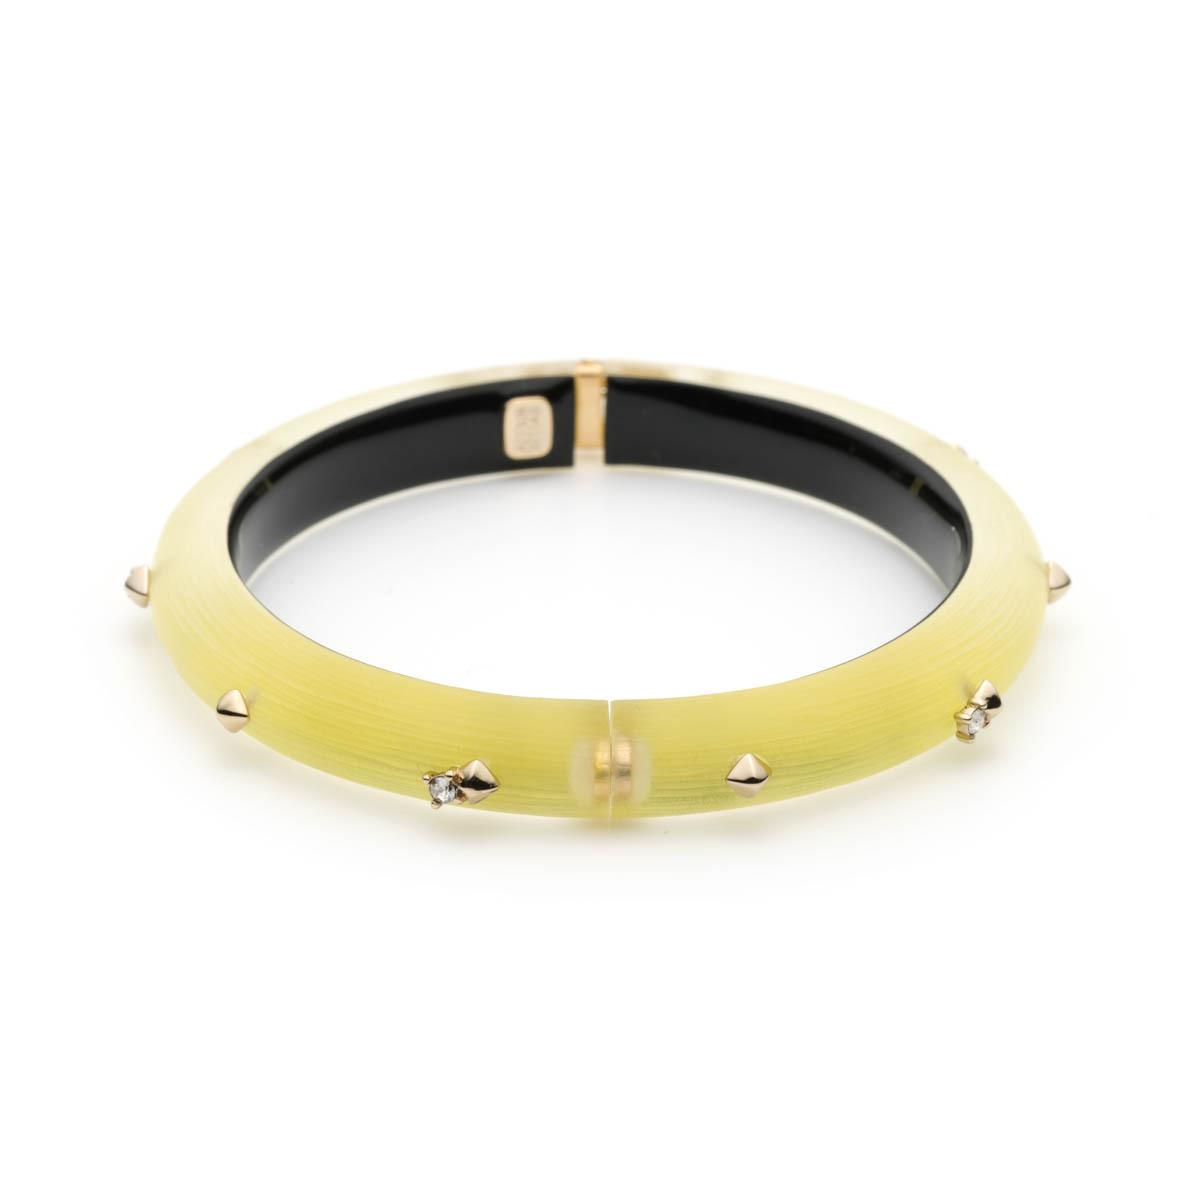 Alexis Bittar Leather Laced Druzy Studded Bangle Bracelet AbJOd